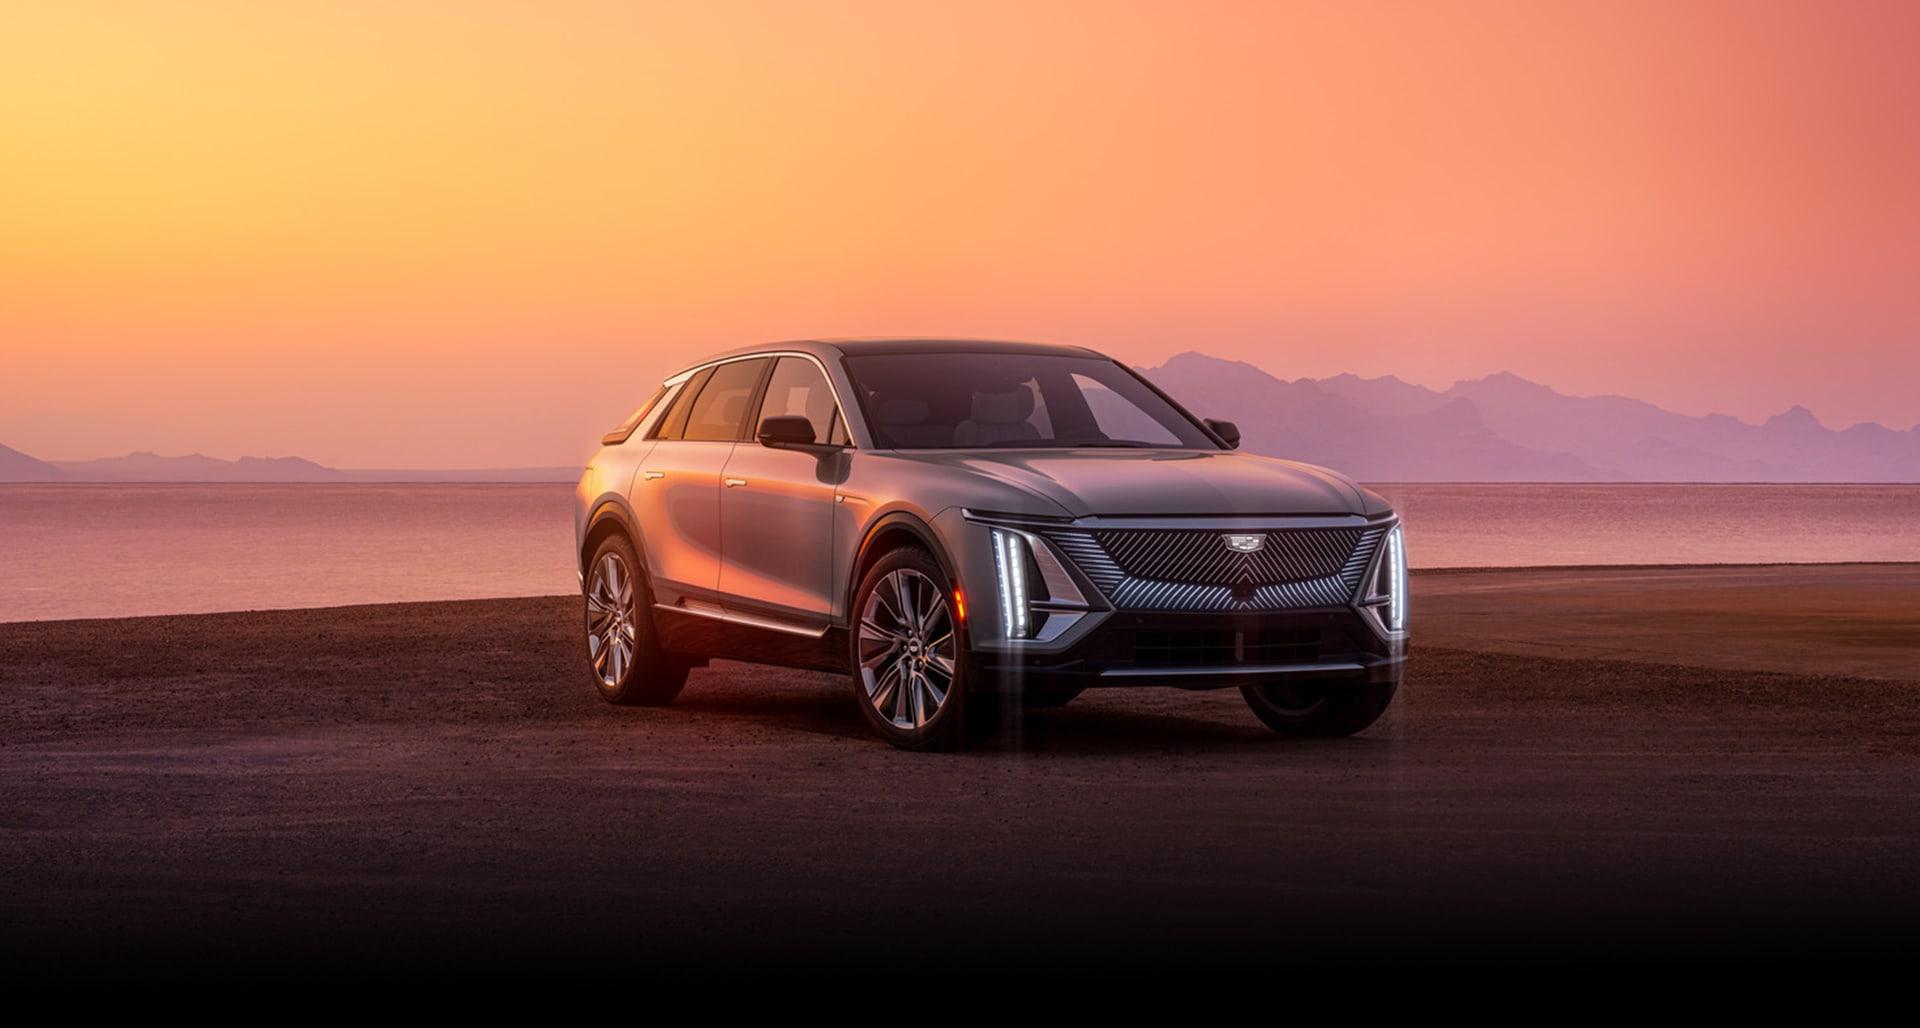 2023 Cadillac Lyriq parked on a beach